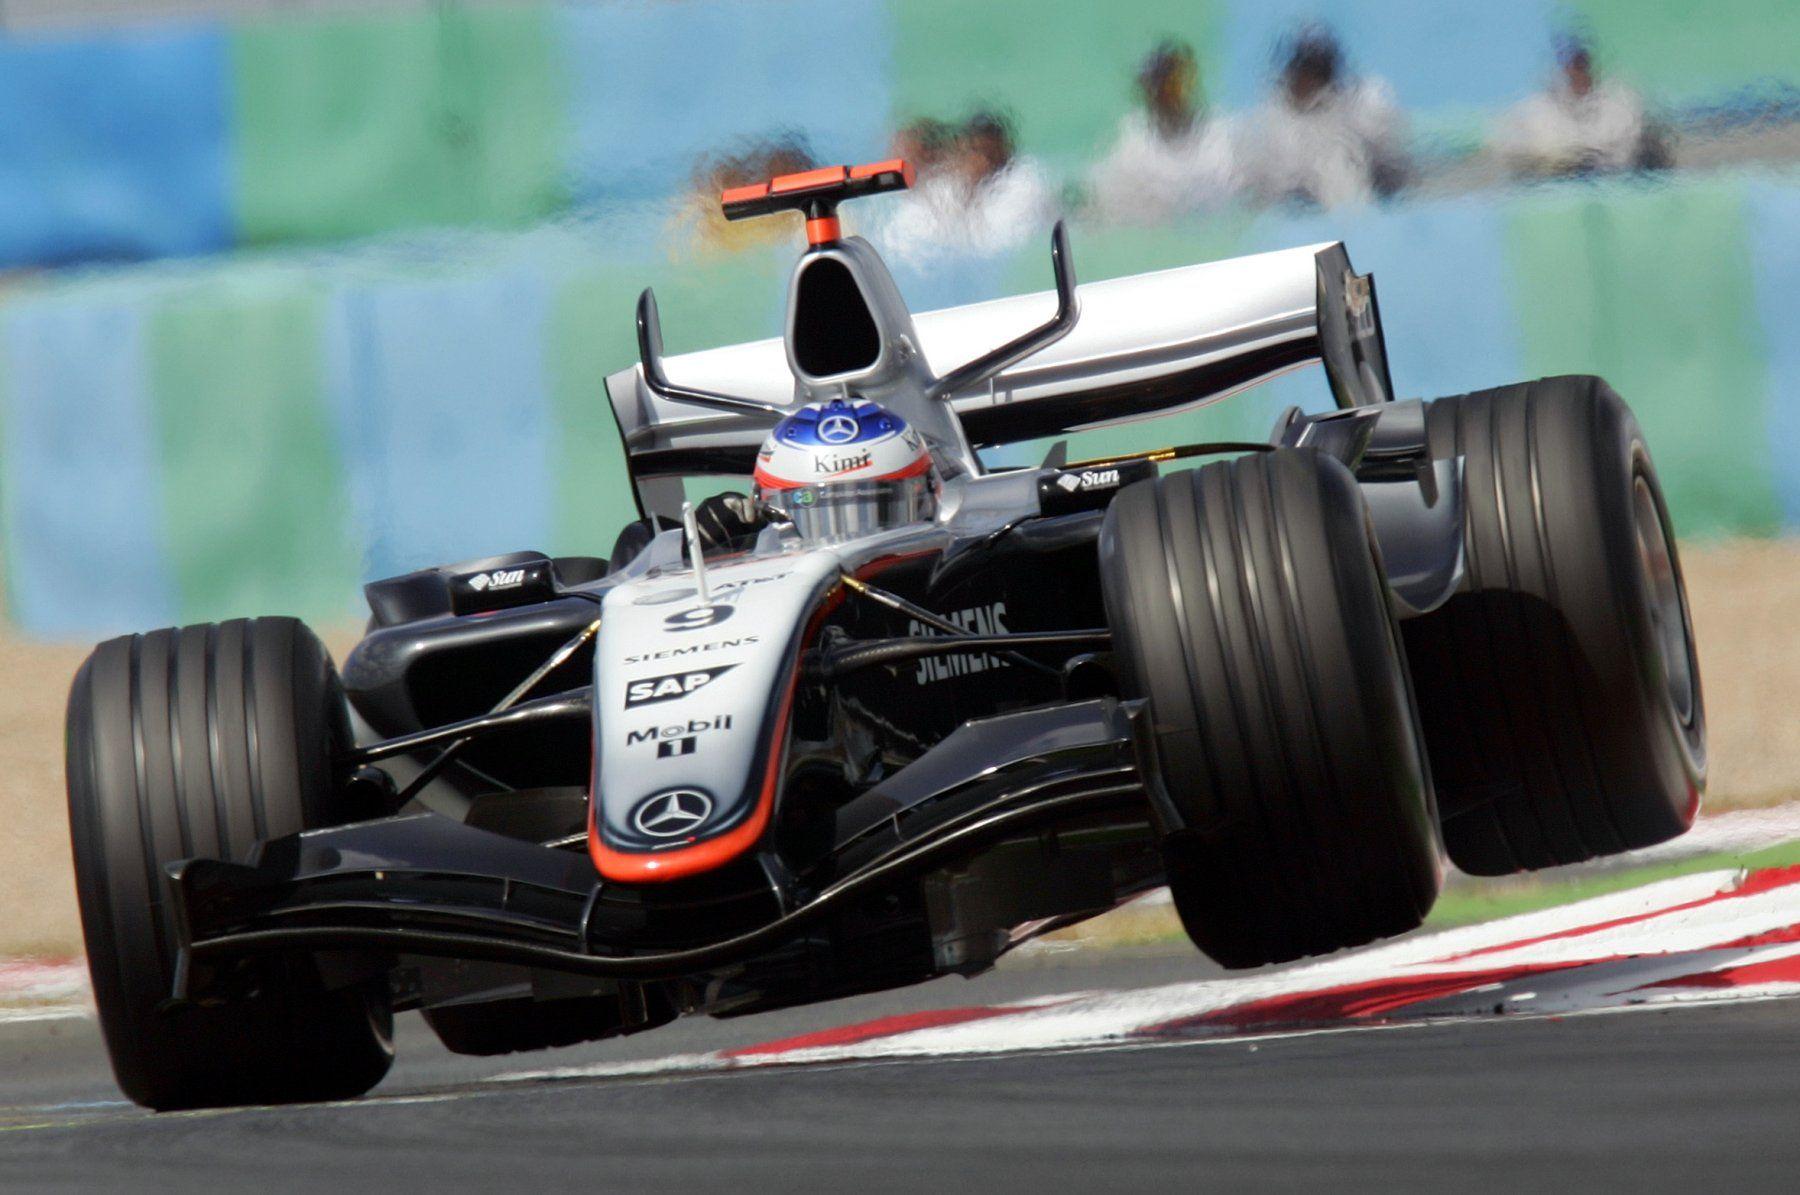 P2: Kimi Räikkönen (FIN) - McLaren-Mercedes MP4-20 - 112 Points #motorsport #racing #f1 #formel1 #formula1 #formulaone #motor #sport #passion